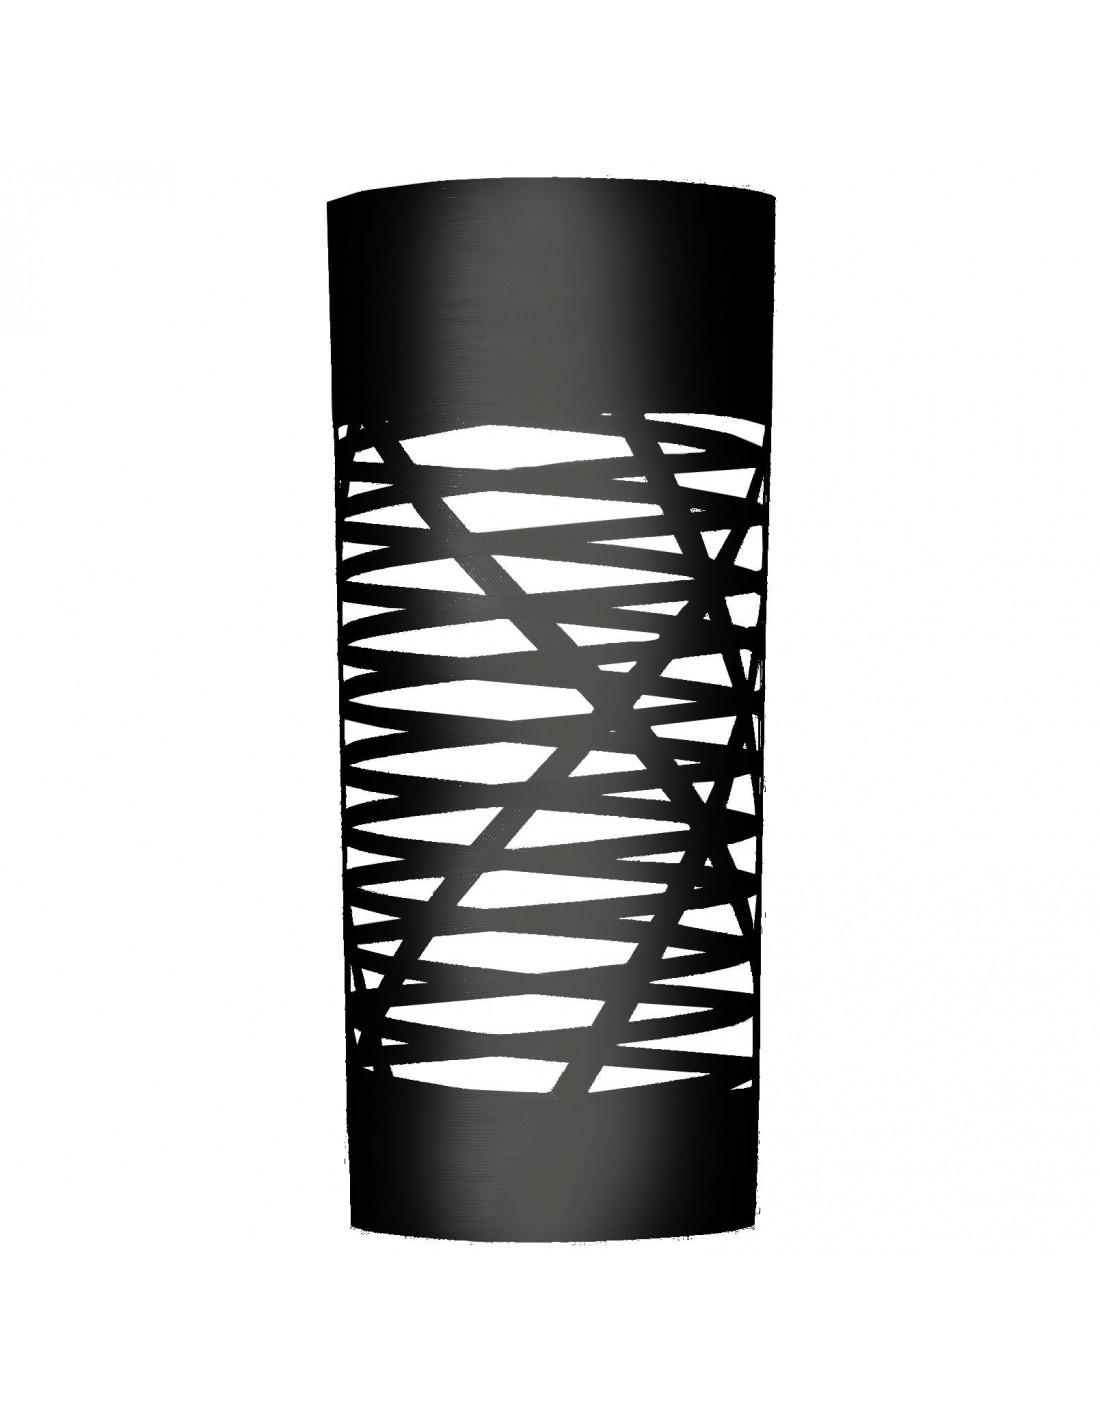 Applique Tress Grande noir - Valente Design